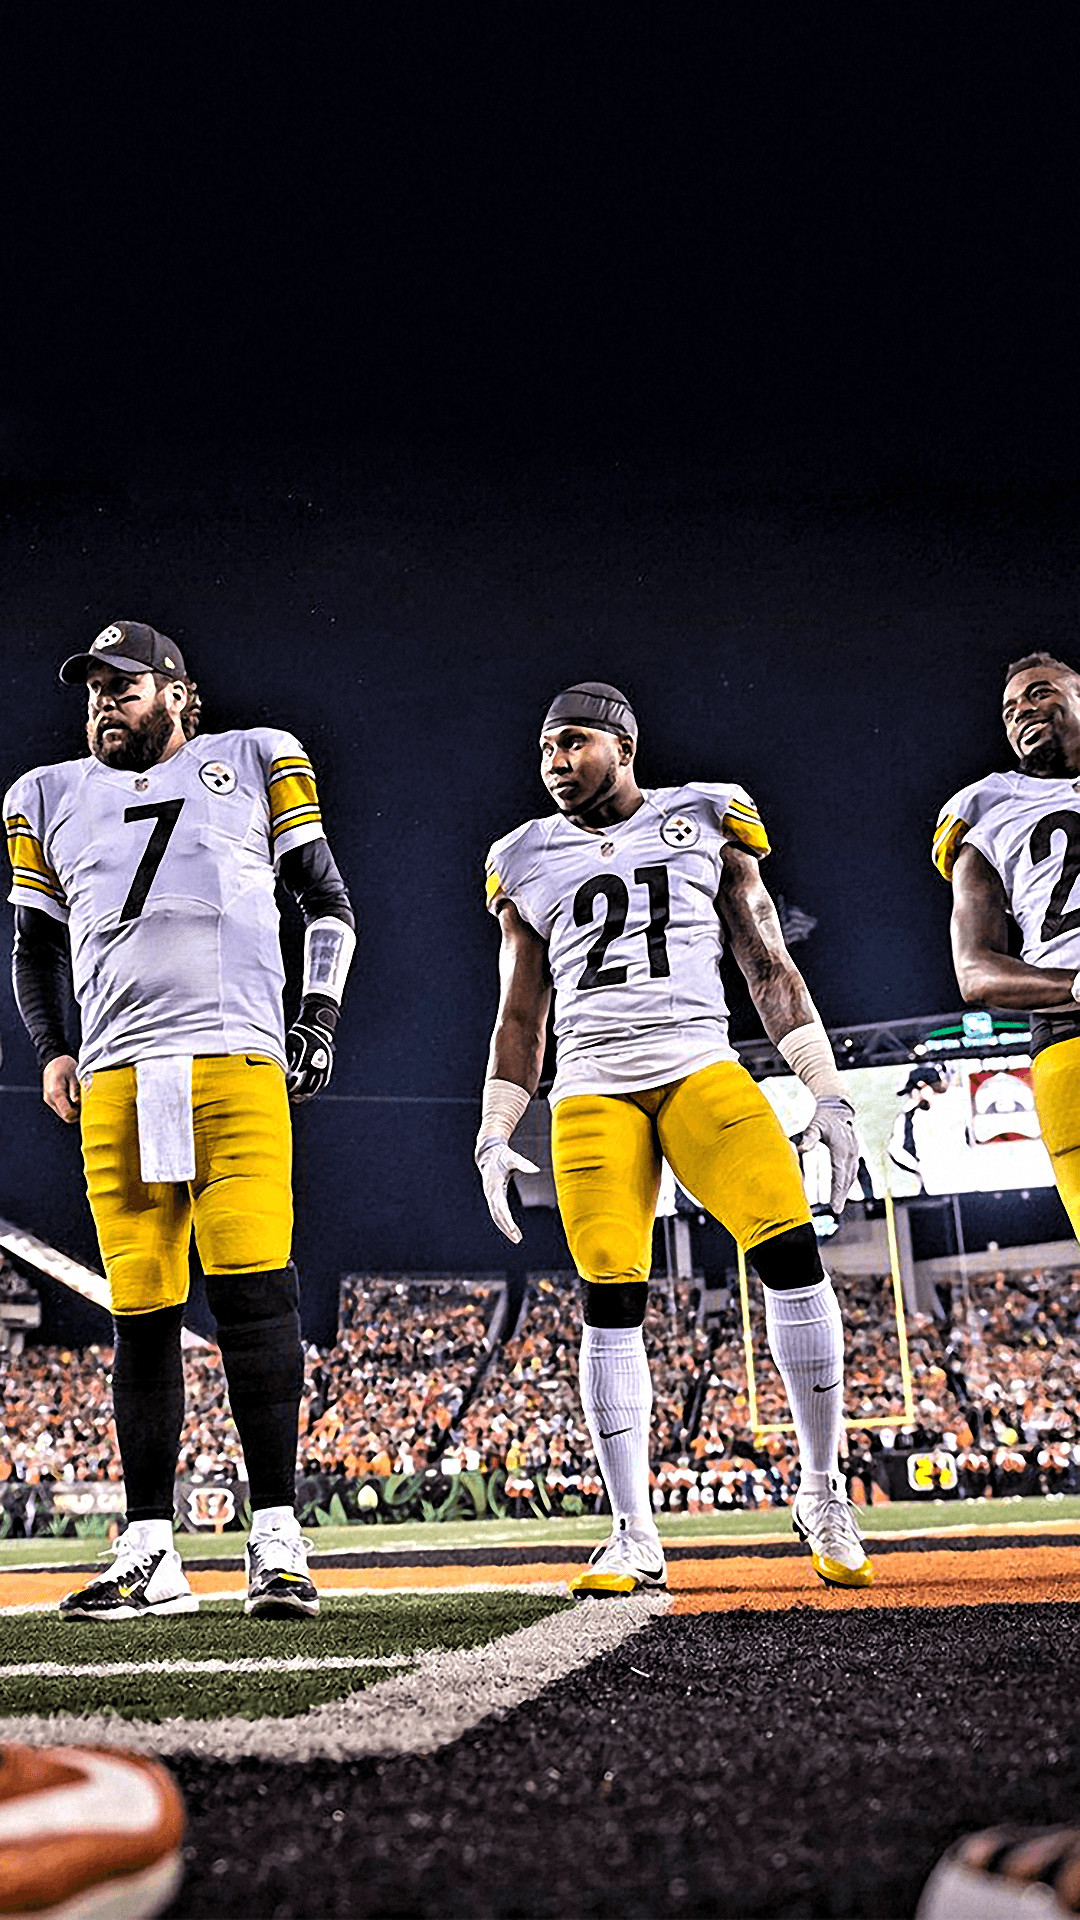 Cool Steelers Wallpapers for iPhone – WallpaperSafari